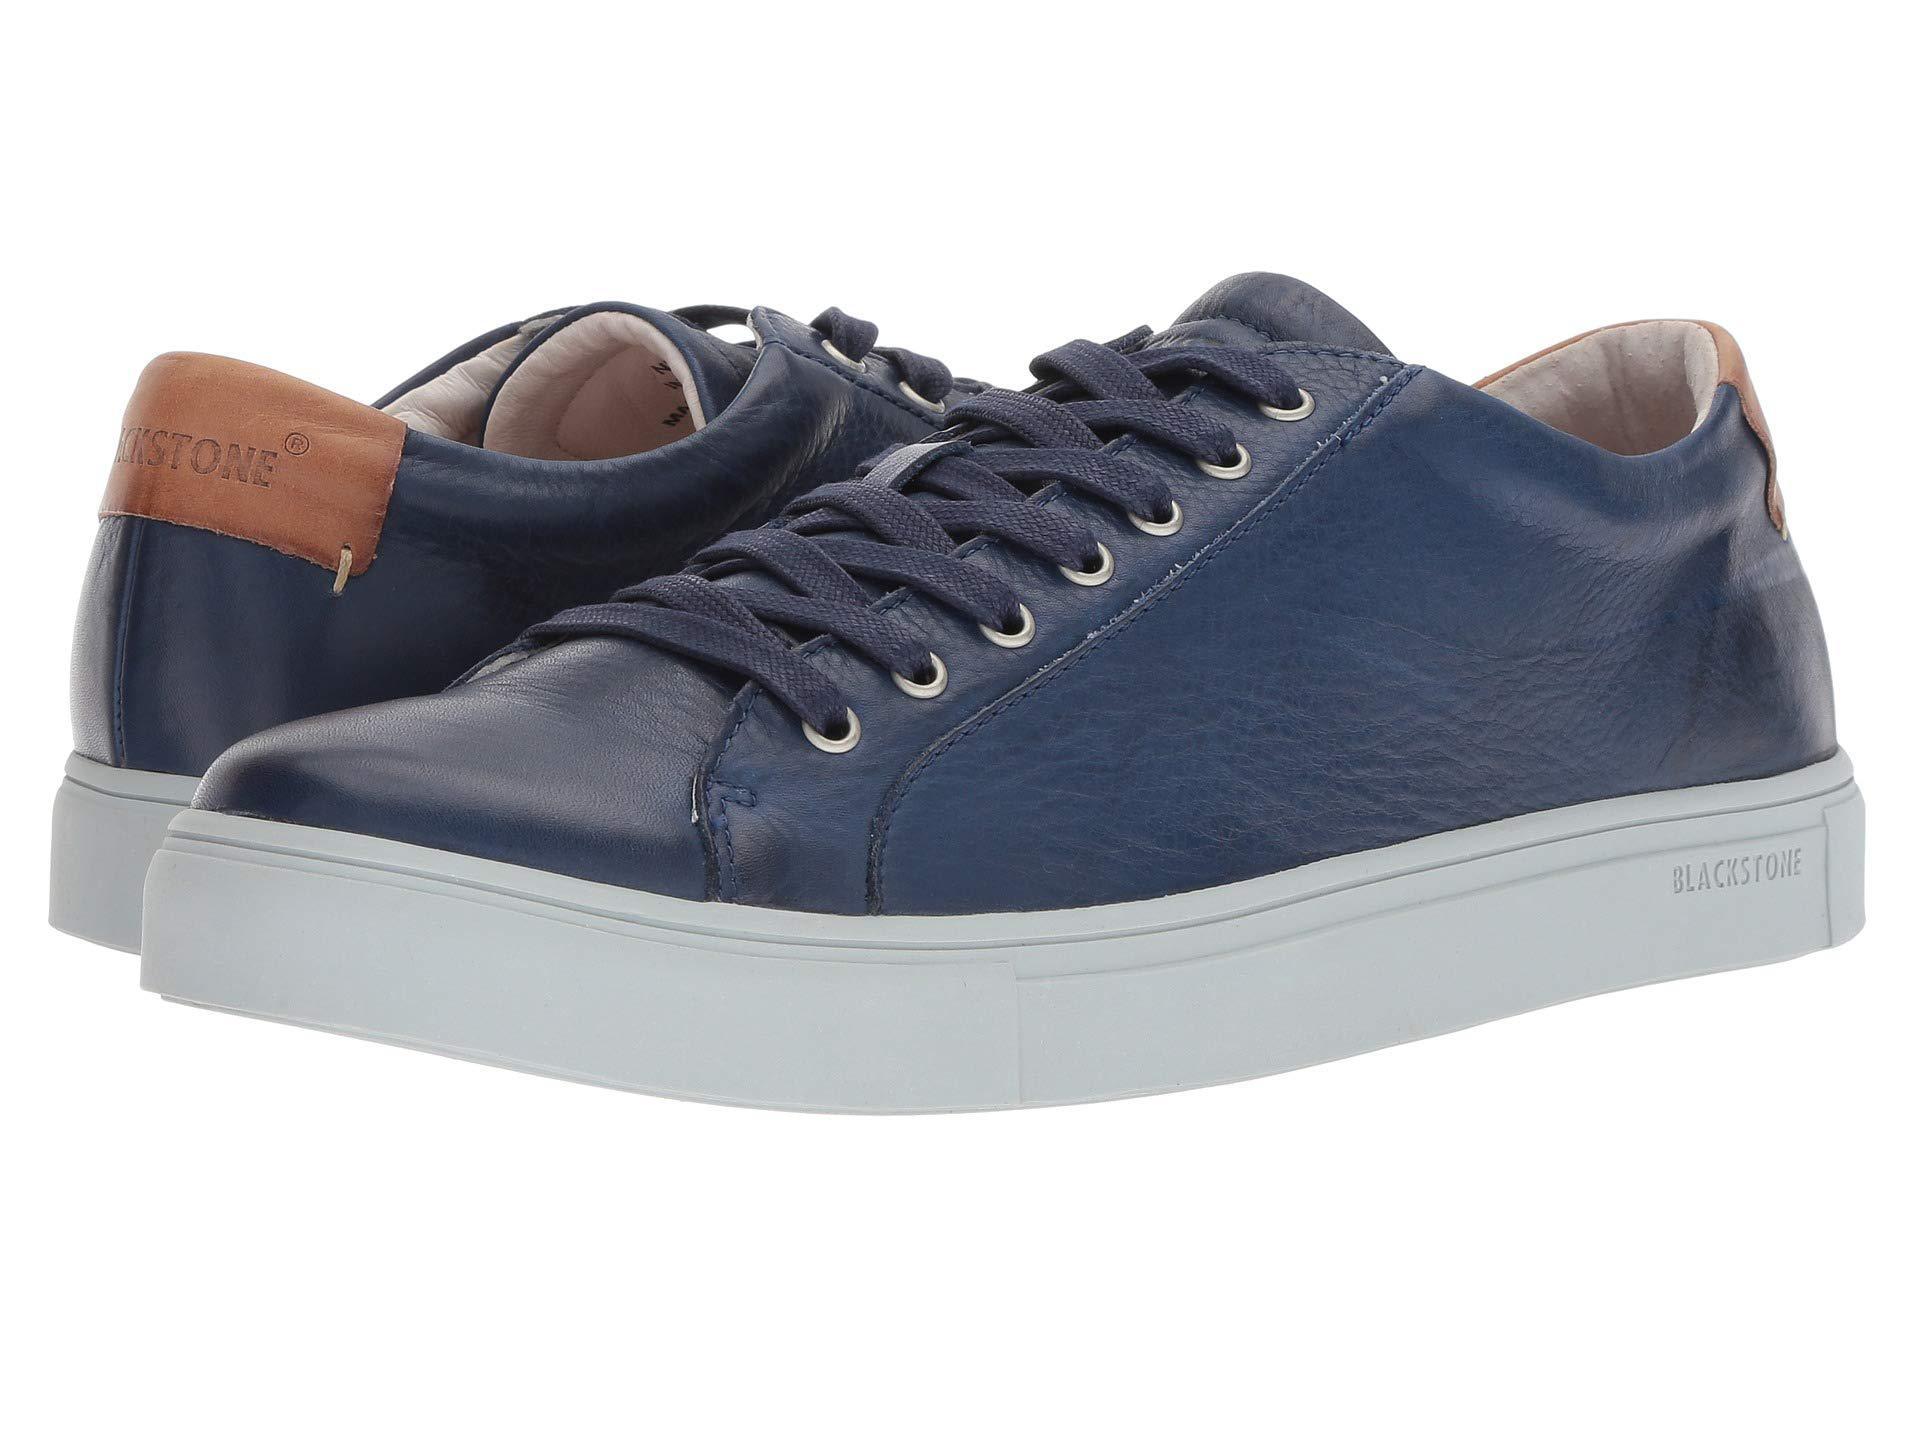 55e5aa5bca Blackstone - Blue Low Sneaker (charcoal) Men's Lace Up Casual Shoes for Men  -. View fullscreen